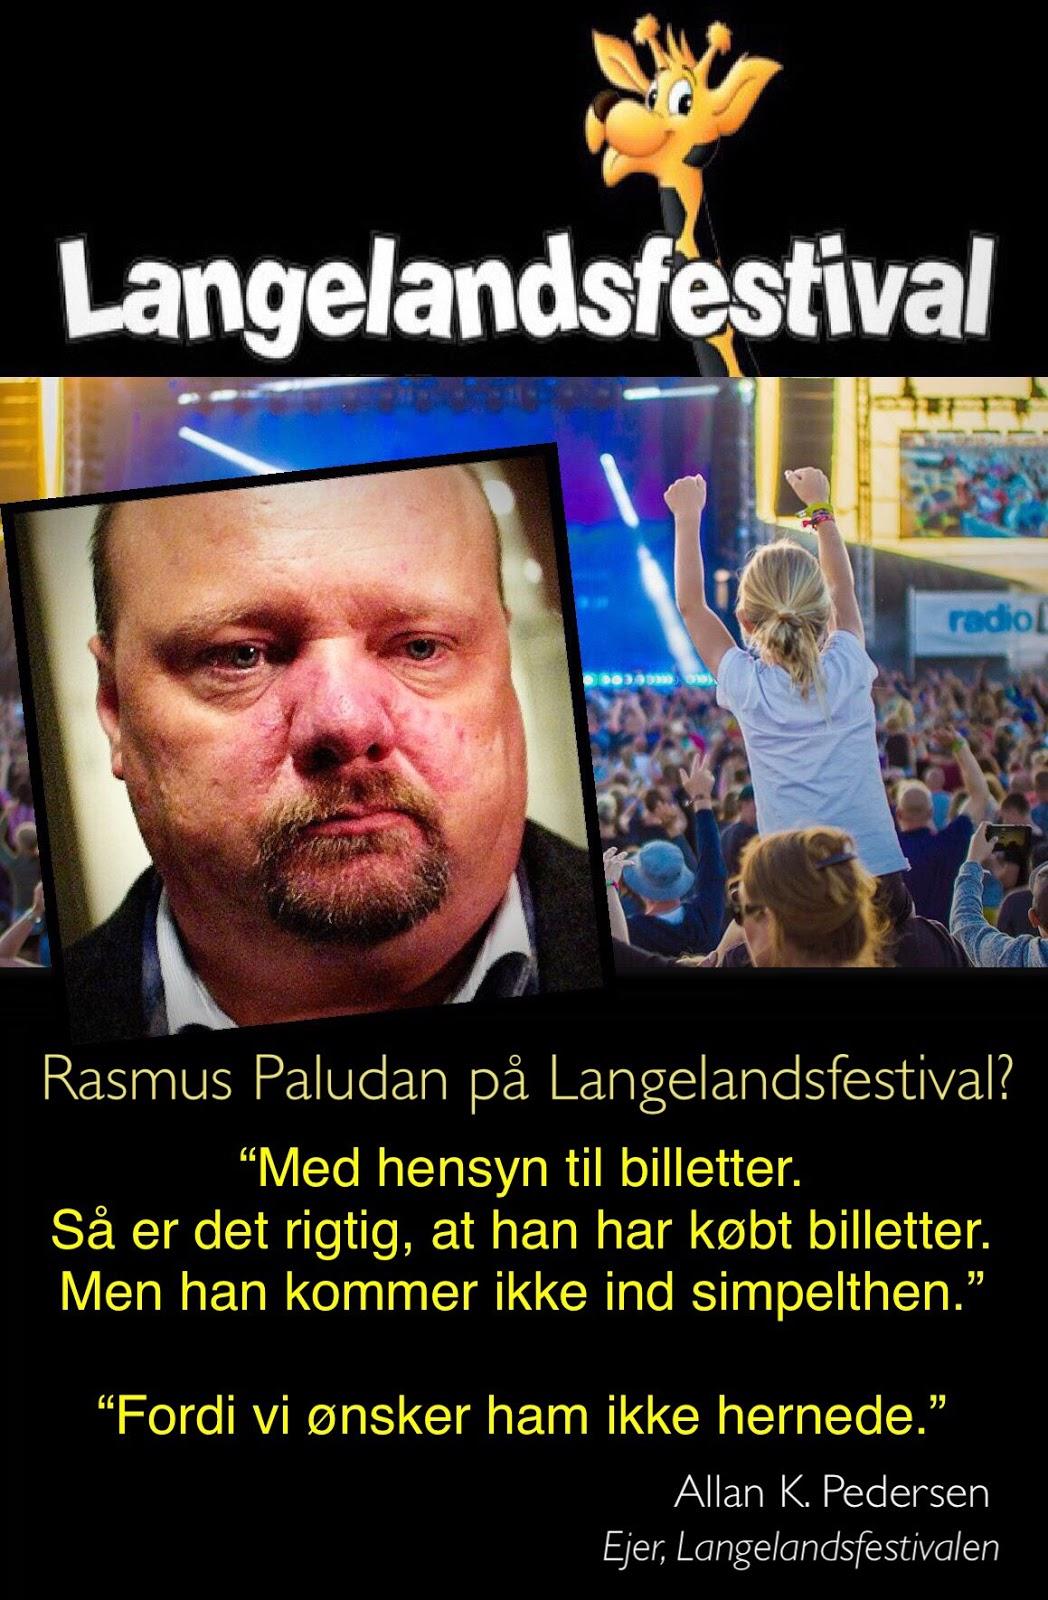 Langelandsfestival Naegter Rasmus Paludan Adgang Festivalen Far En